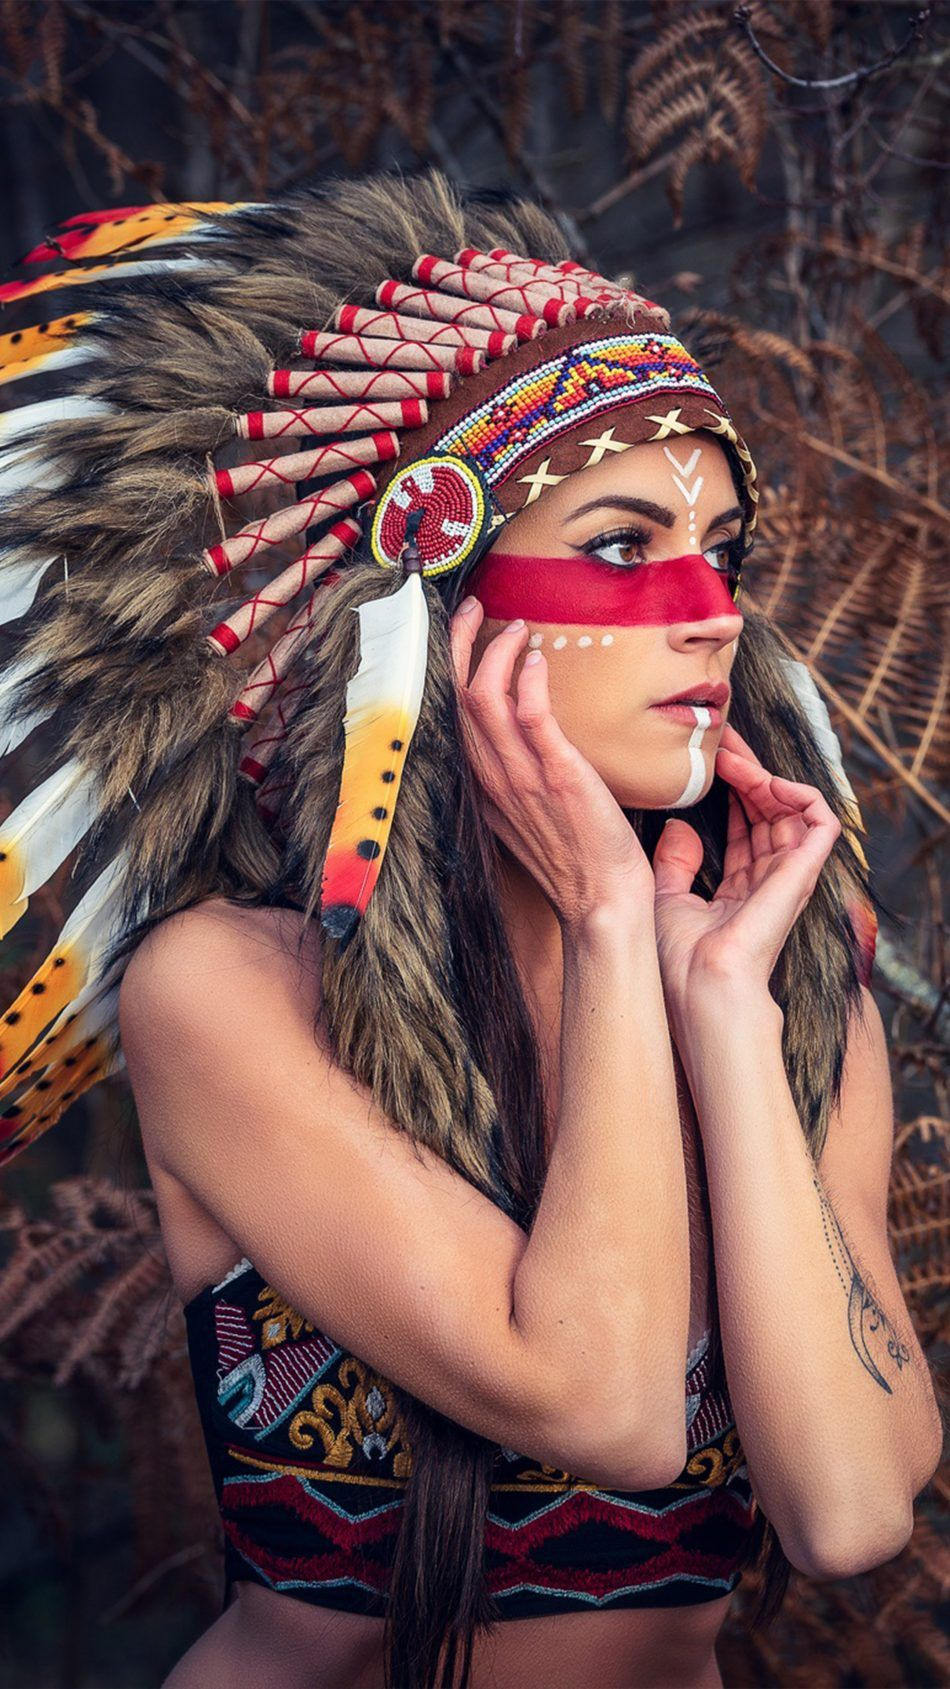 Girl Headdress Native American 4k Ultra Hd Mobile Wallpaper Native American Headdress Headdress Cute Girl Wallpaper